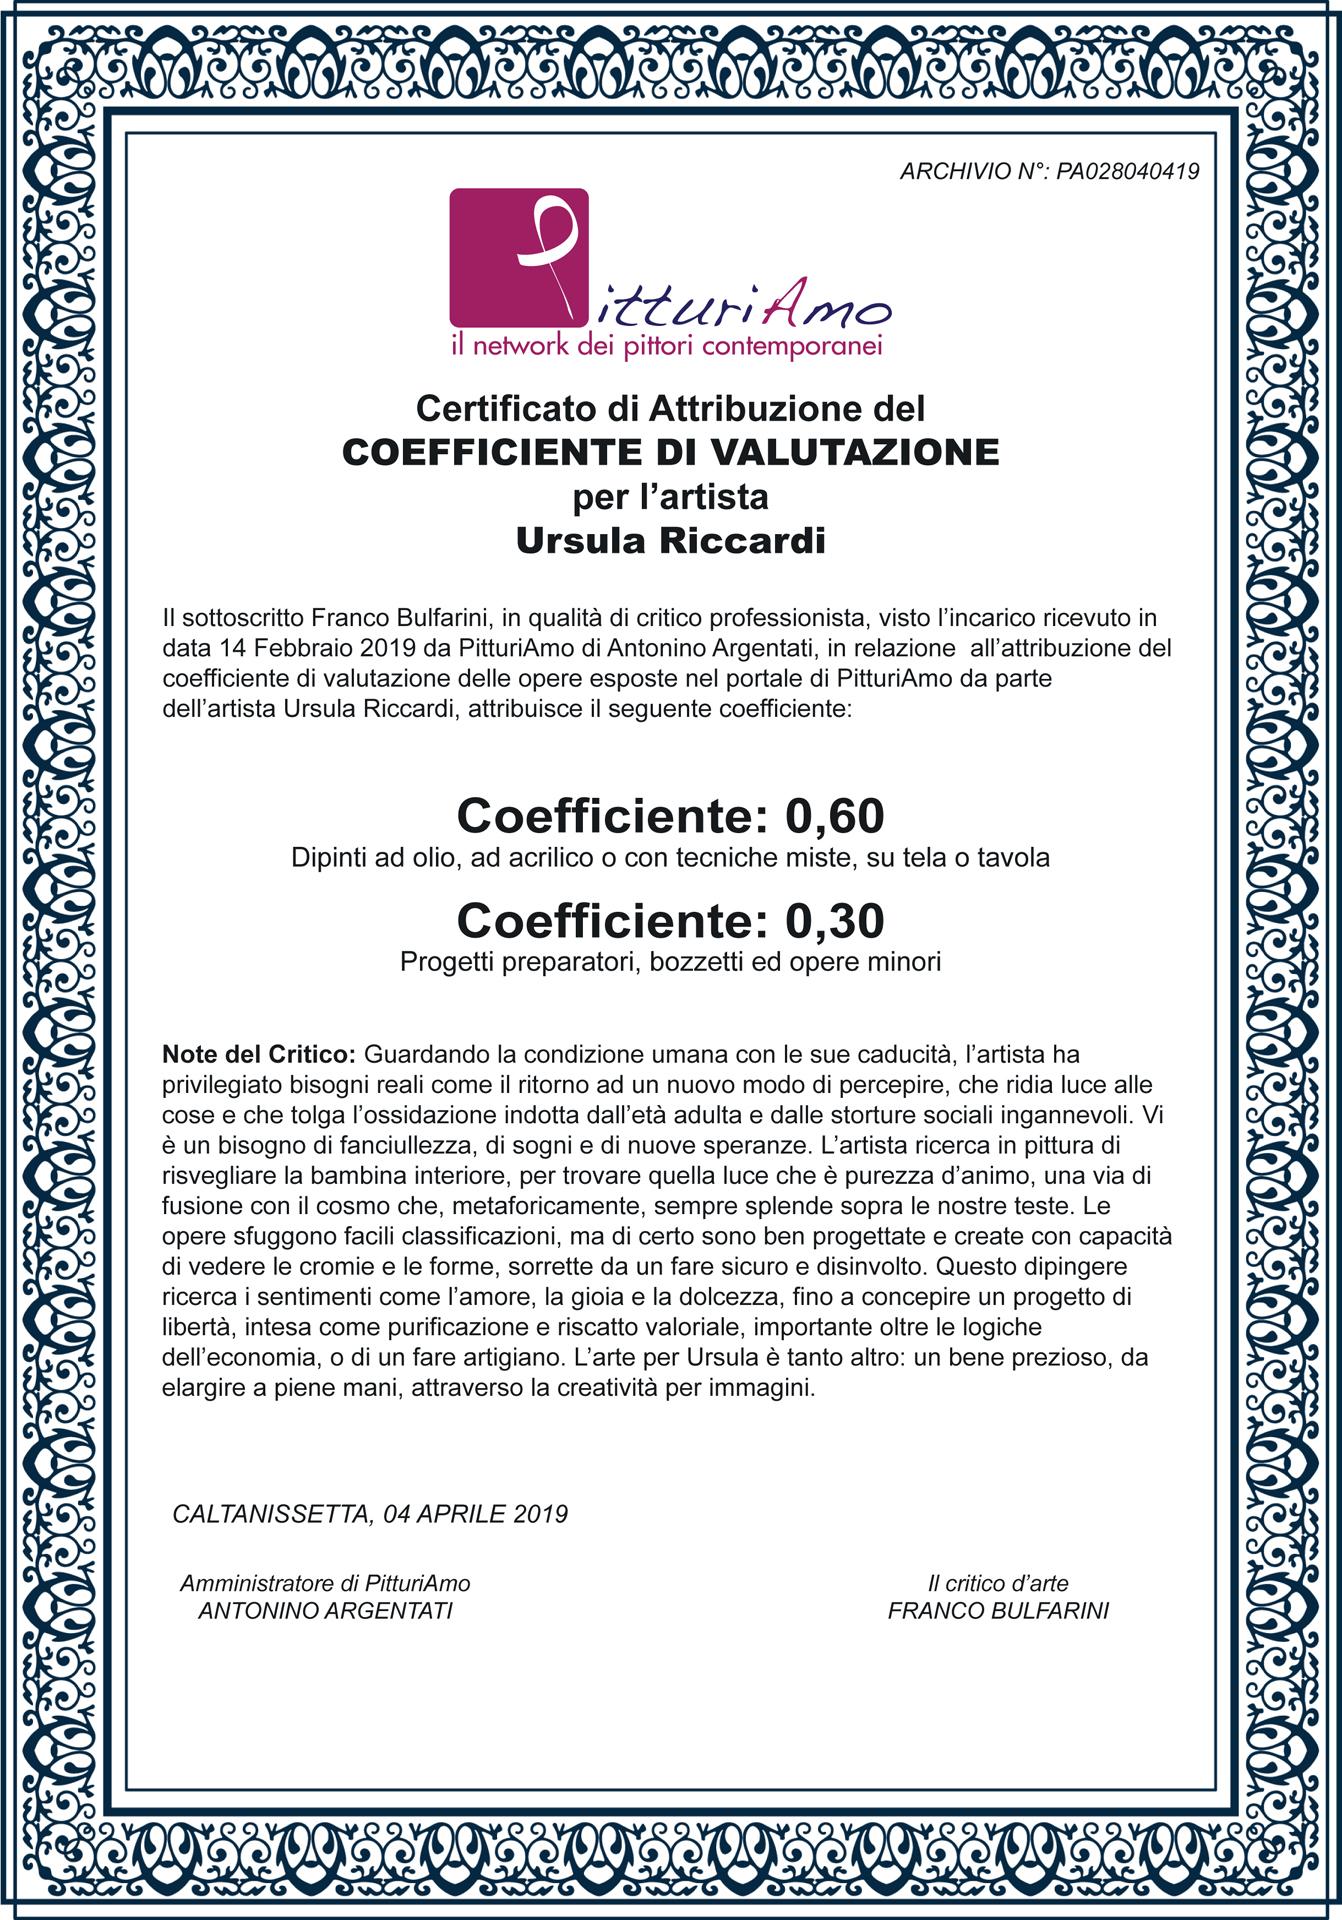 Coefficiente di valutazione artistica di Ursula Riccardi - Pittrice contemporanea